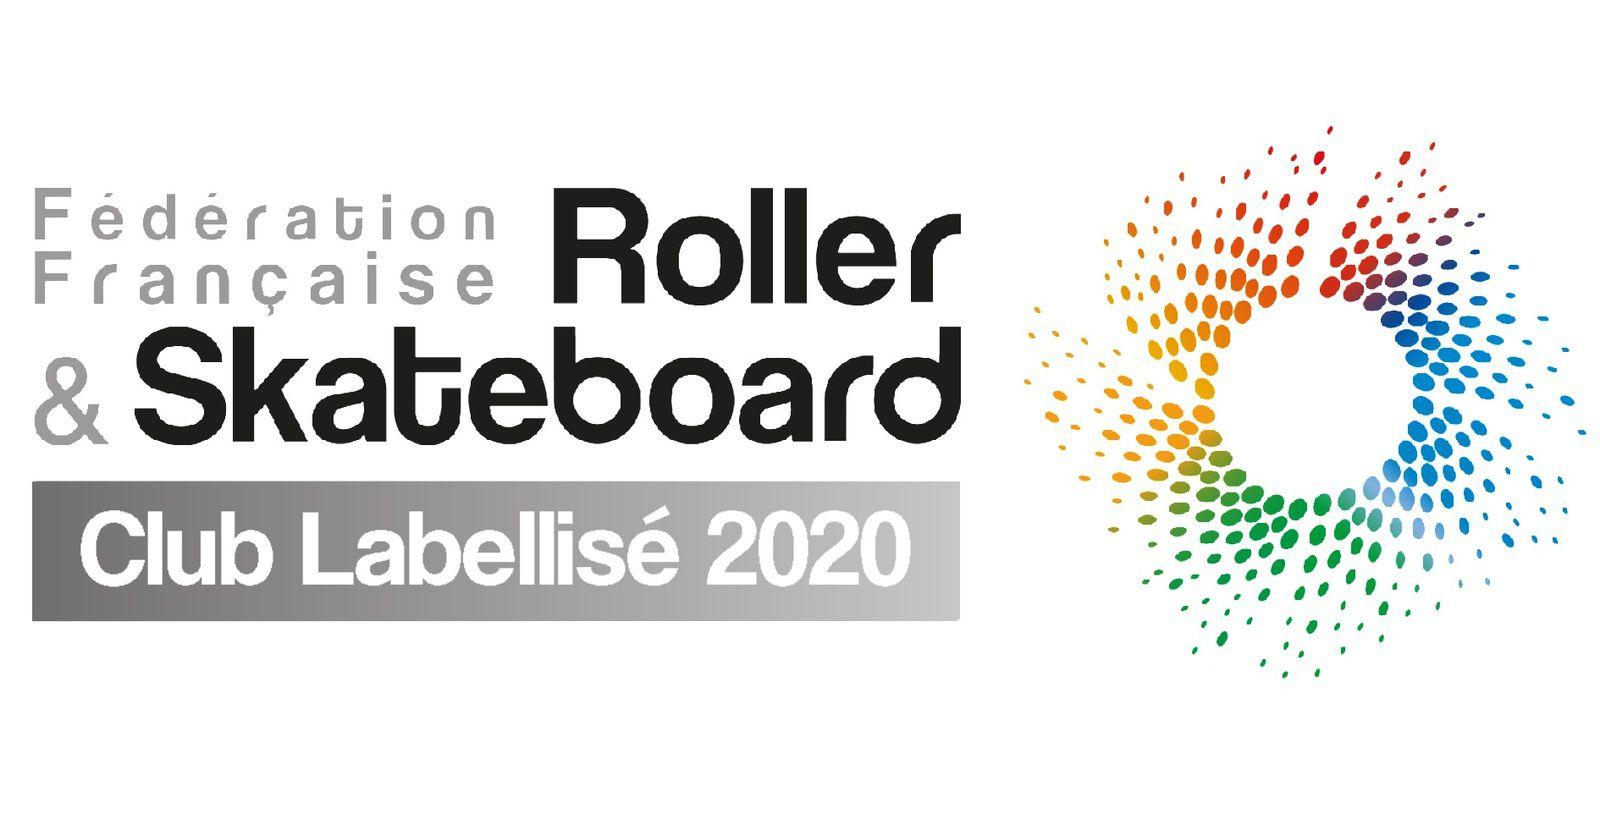 Roller, lib, nimes, club, sport, montpellier, association, sportive, Gard